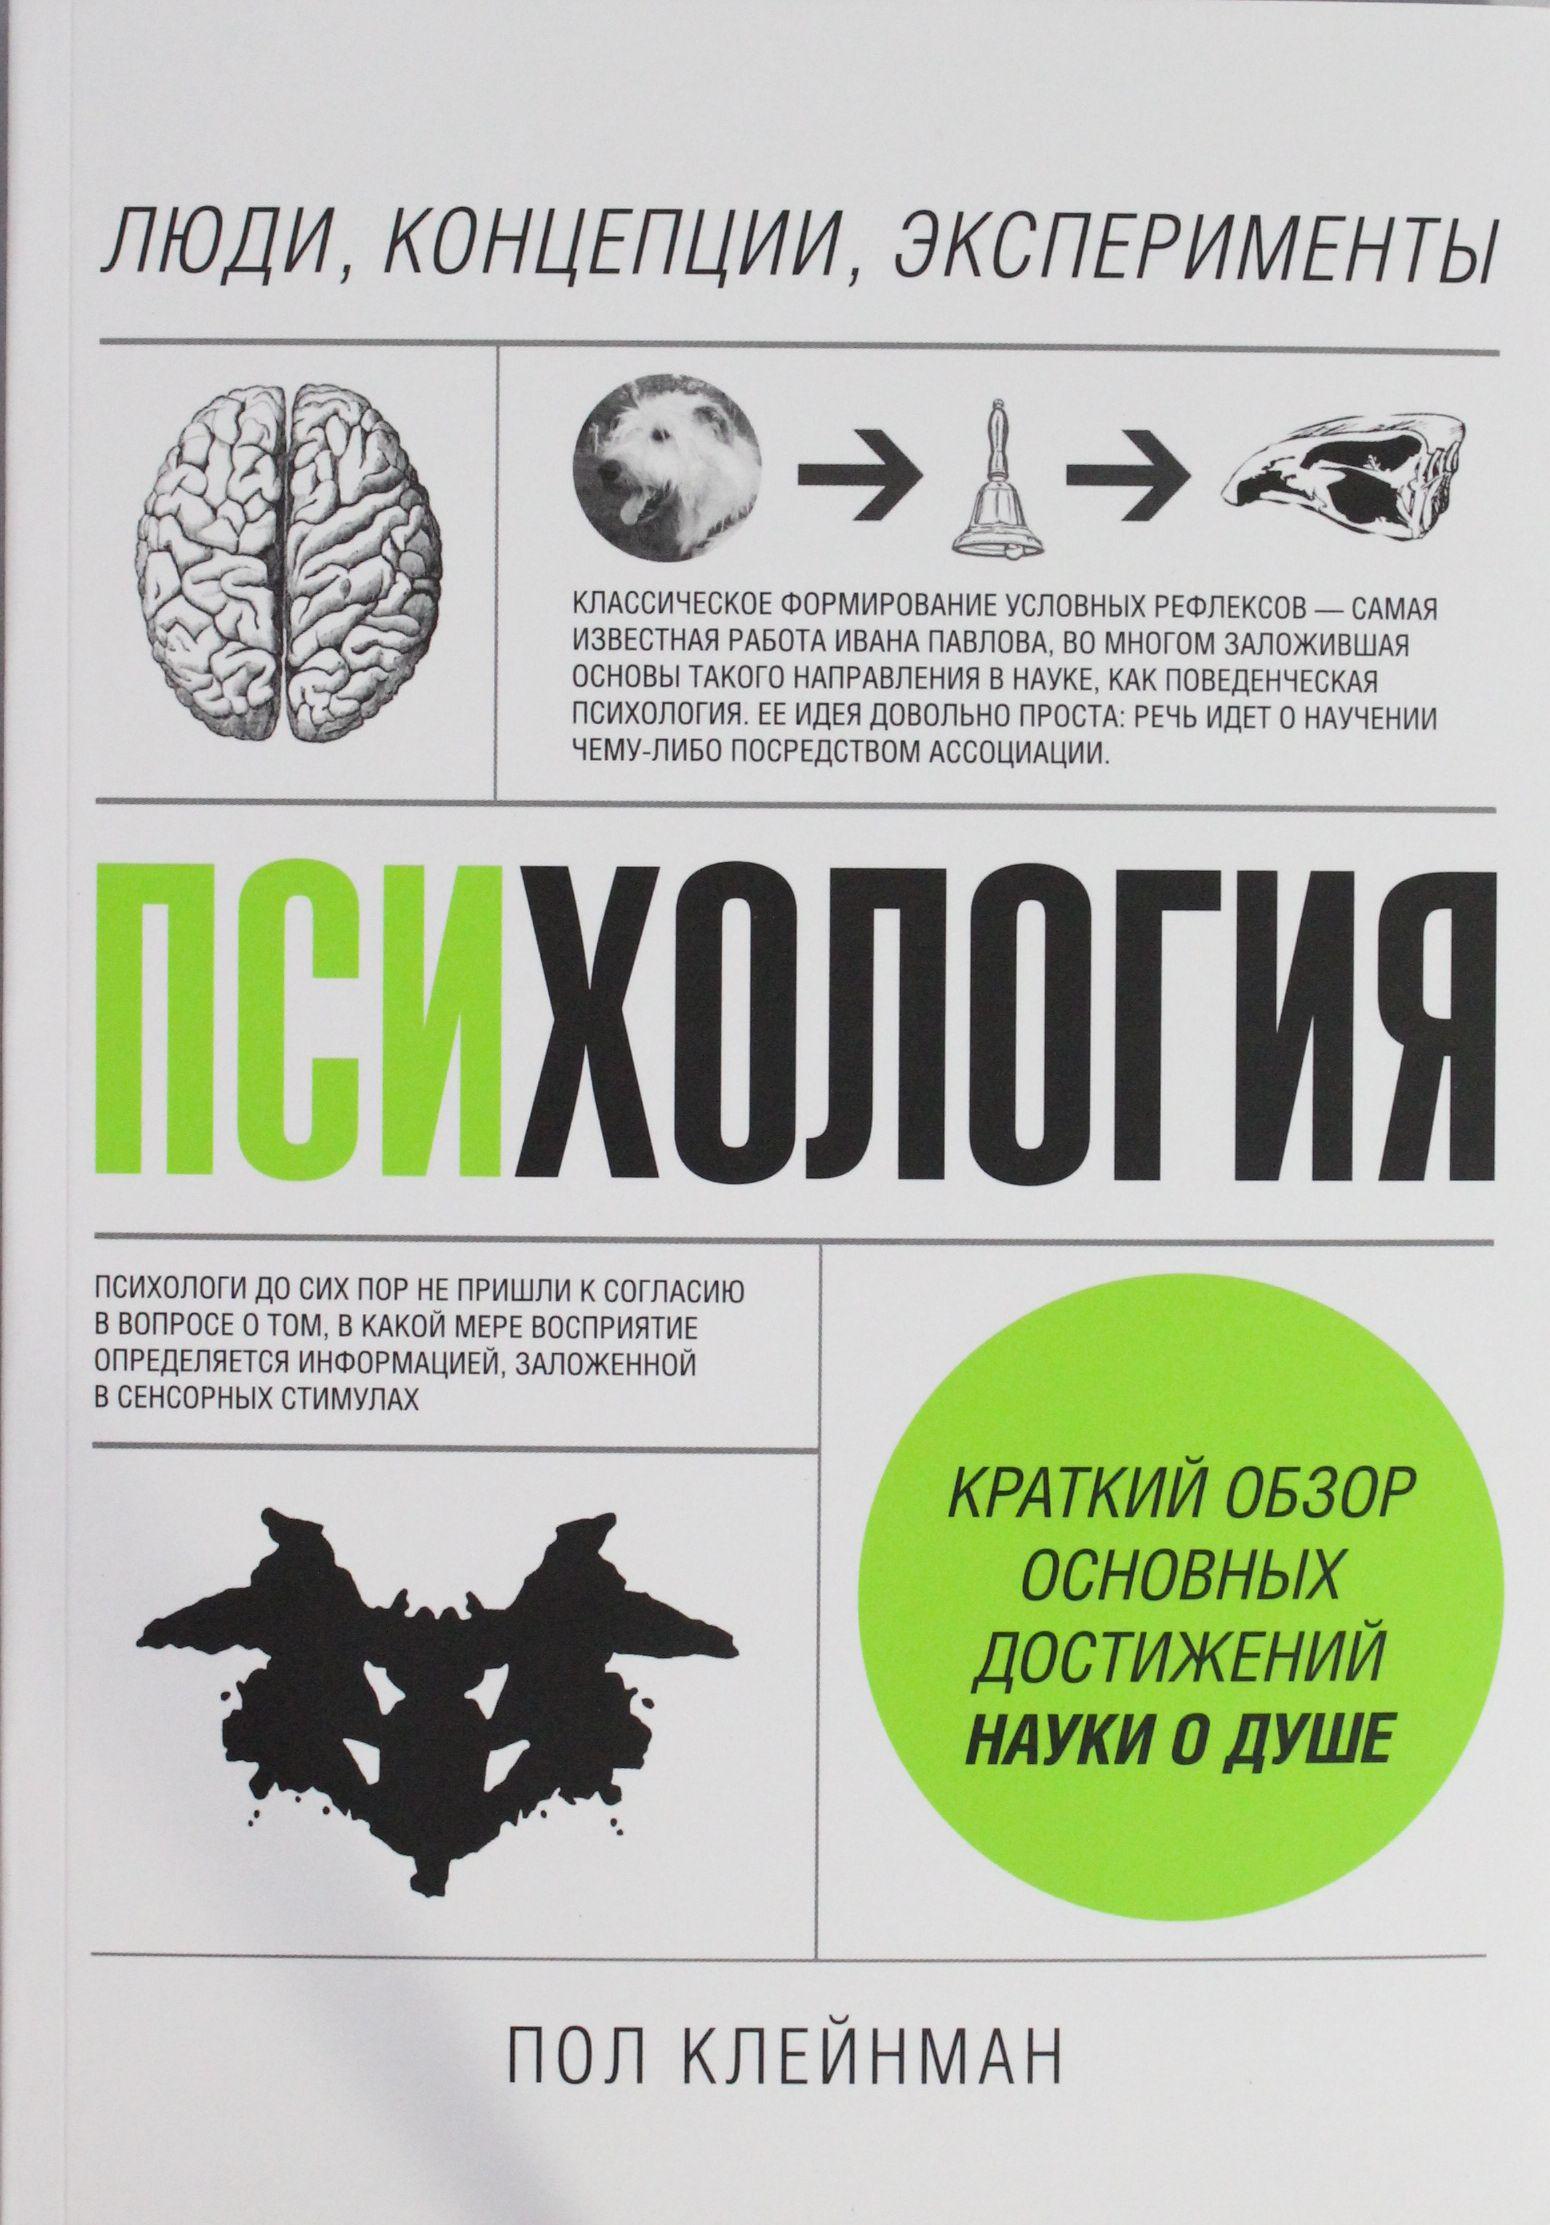 Psikhologija. Ljudi, kontseptsii, eksperimenty